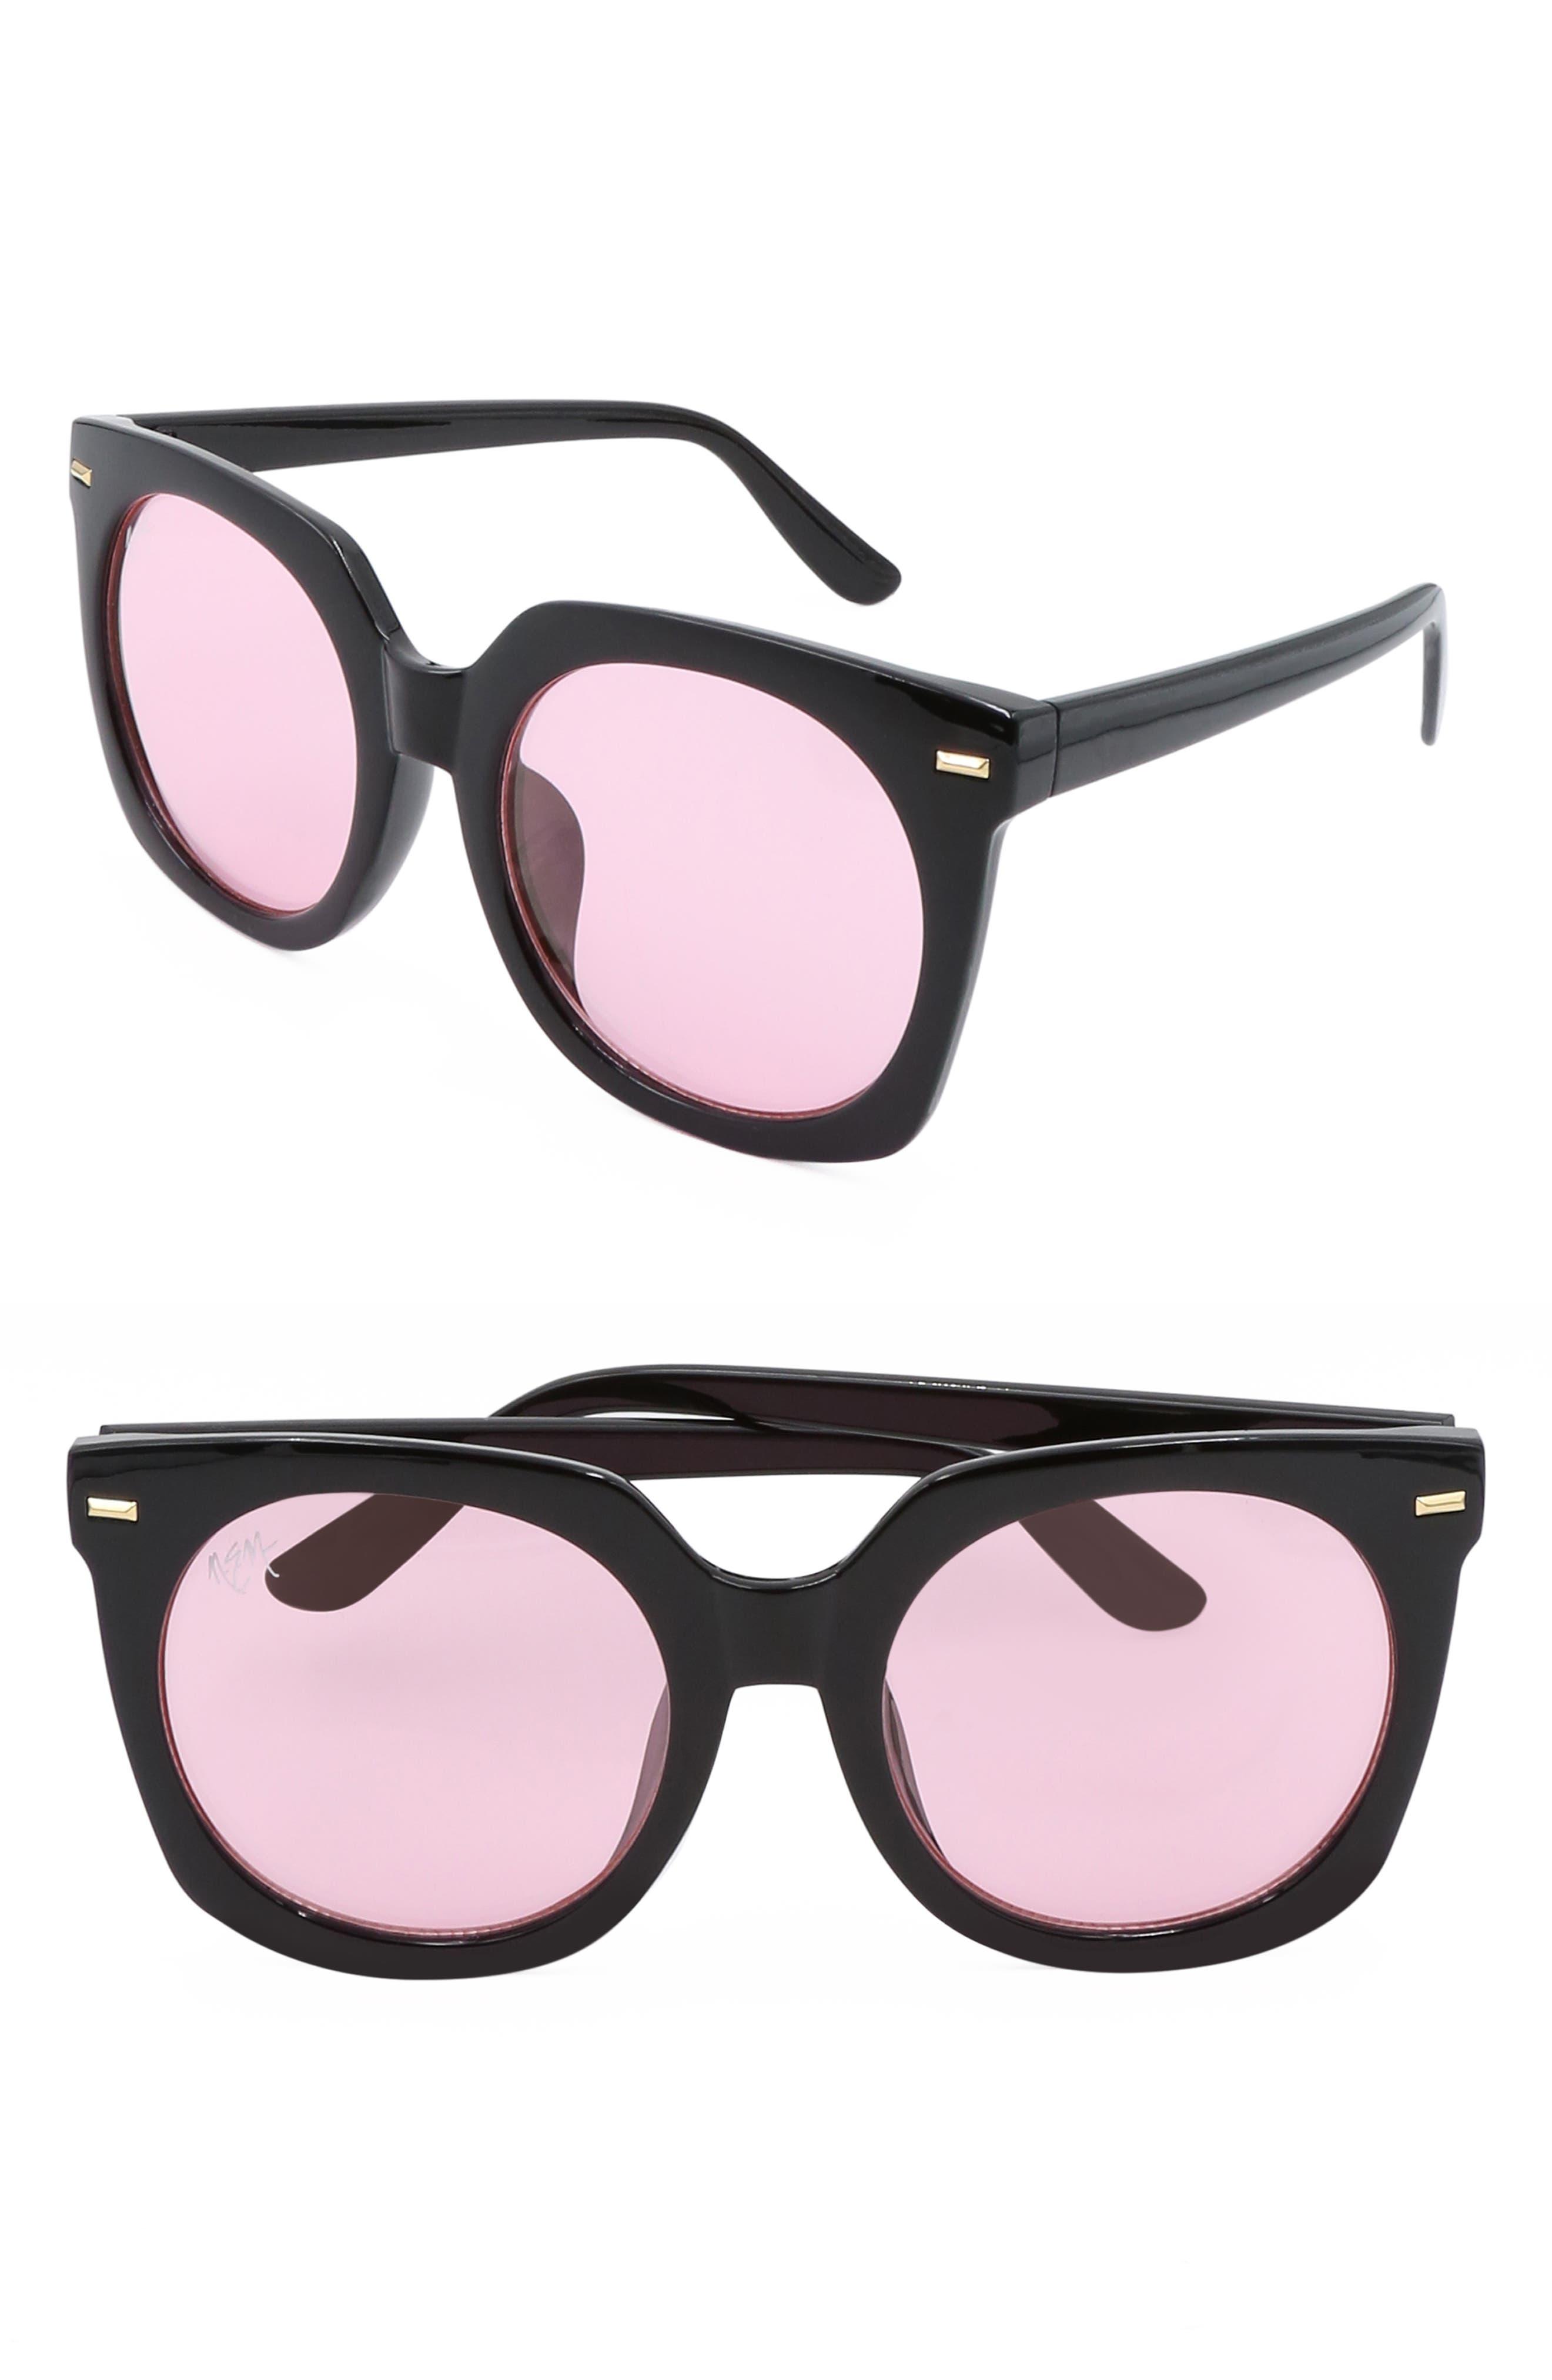 Nem Melrose 55Mm Square Sunglasses - Black W Pink Half Tint Lens